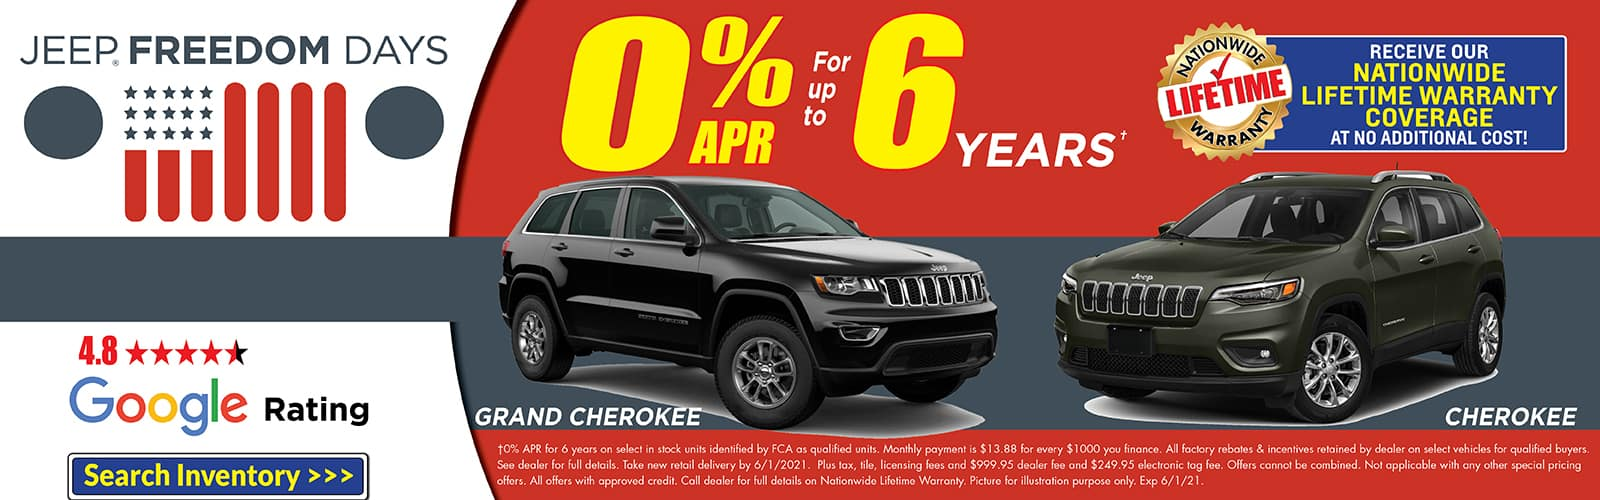 Jeep May 1600×500 Slide 5_4_212